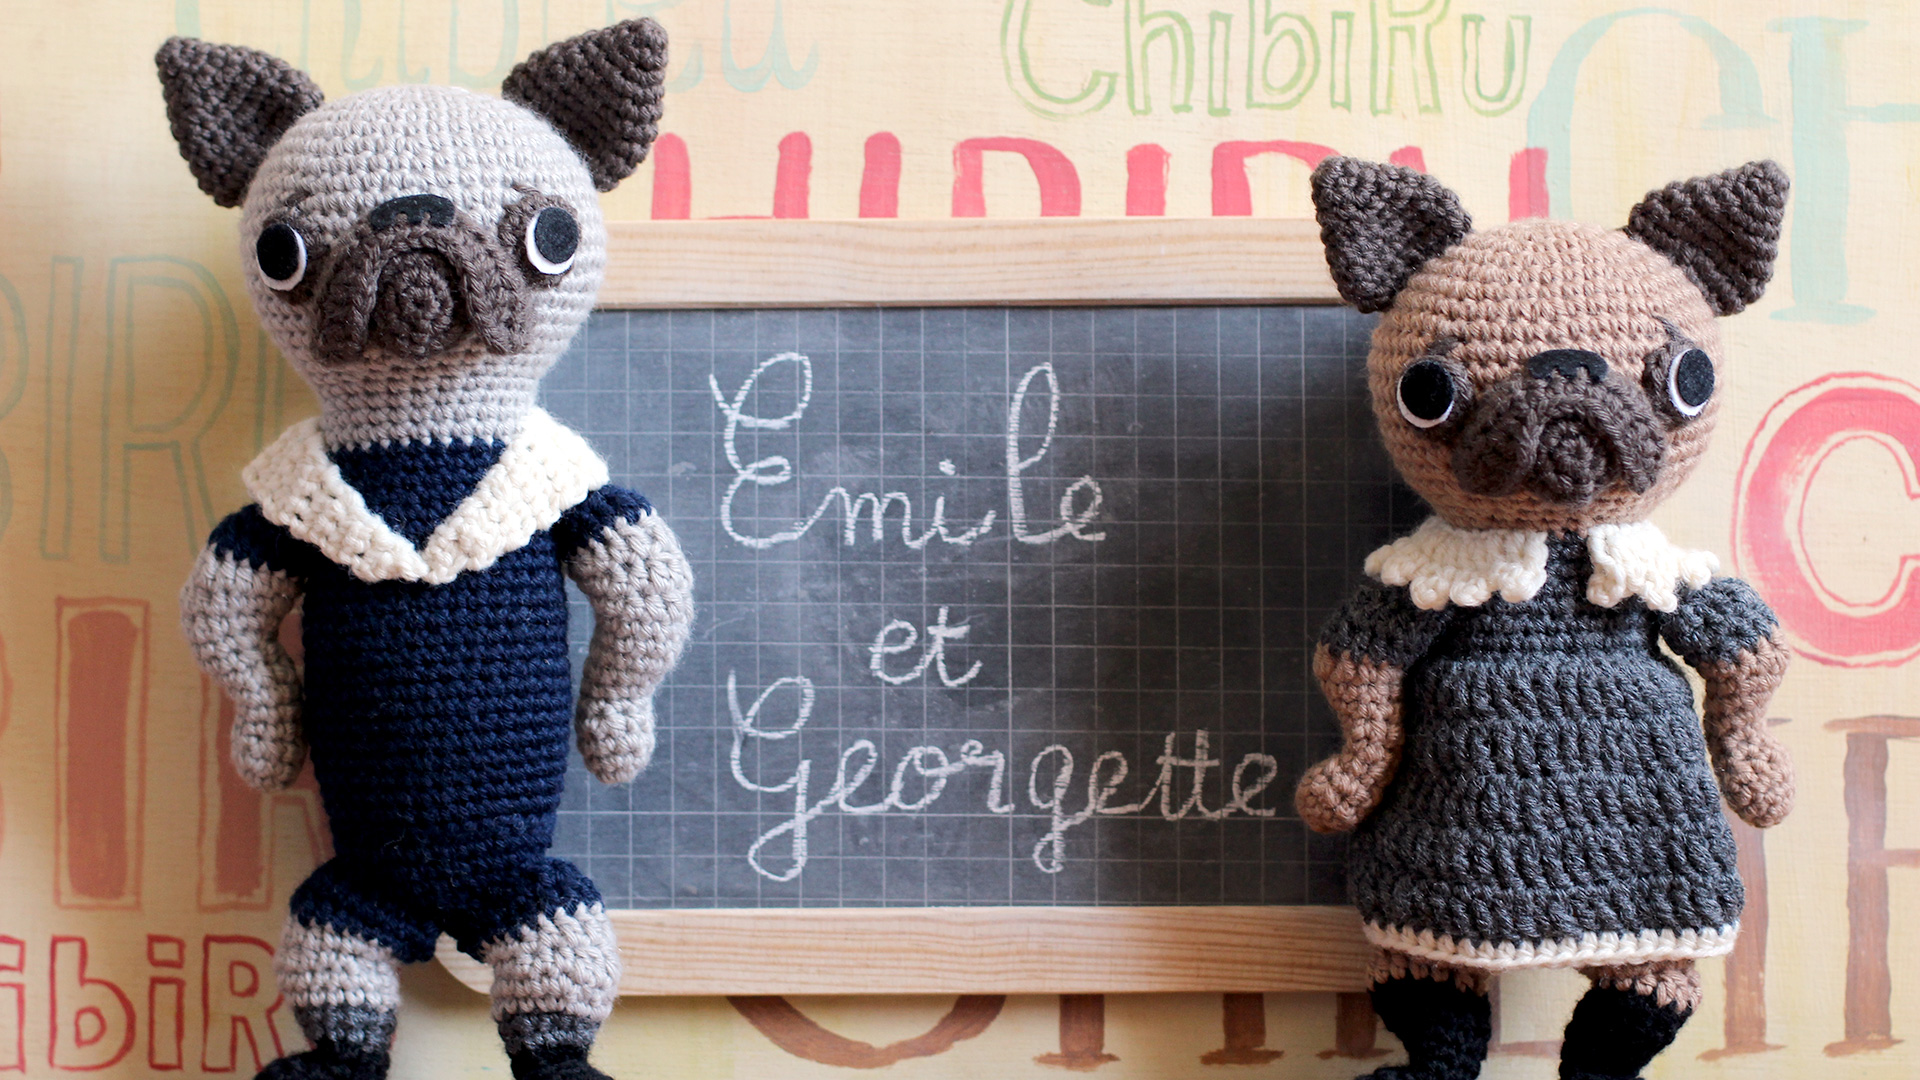 Émile & Georgette - Zoomup